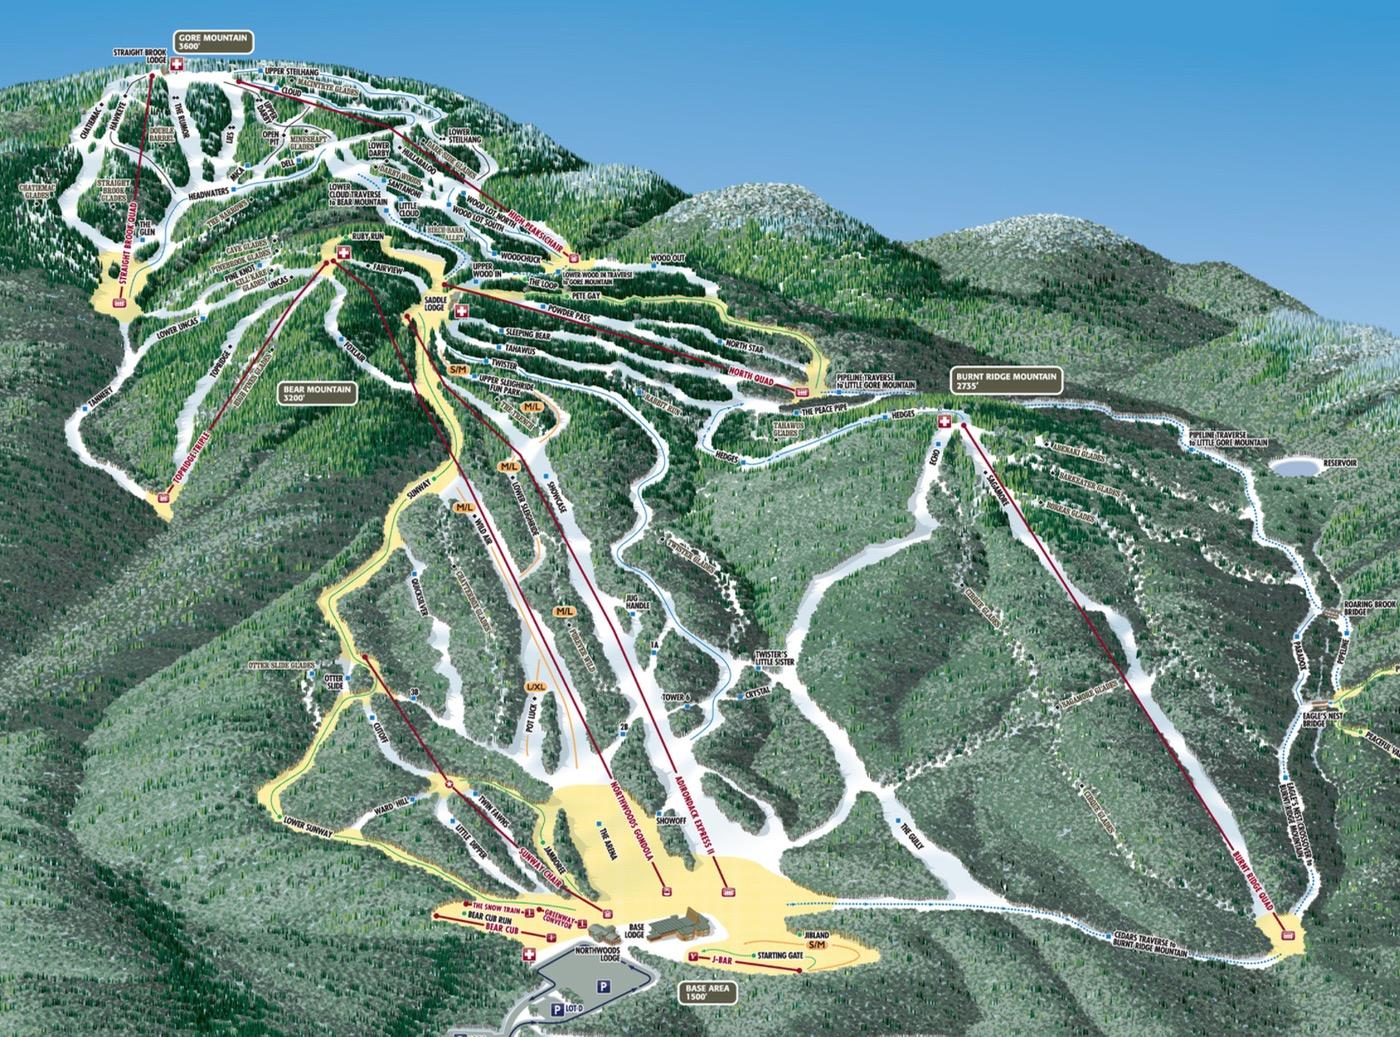 gore-mountain-trail-map